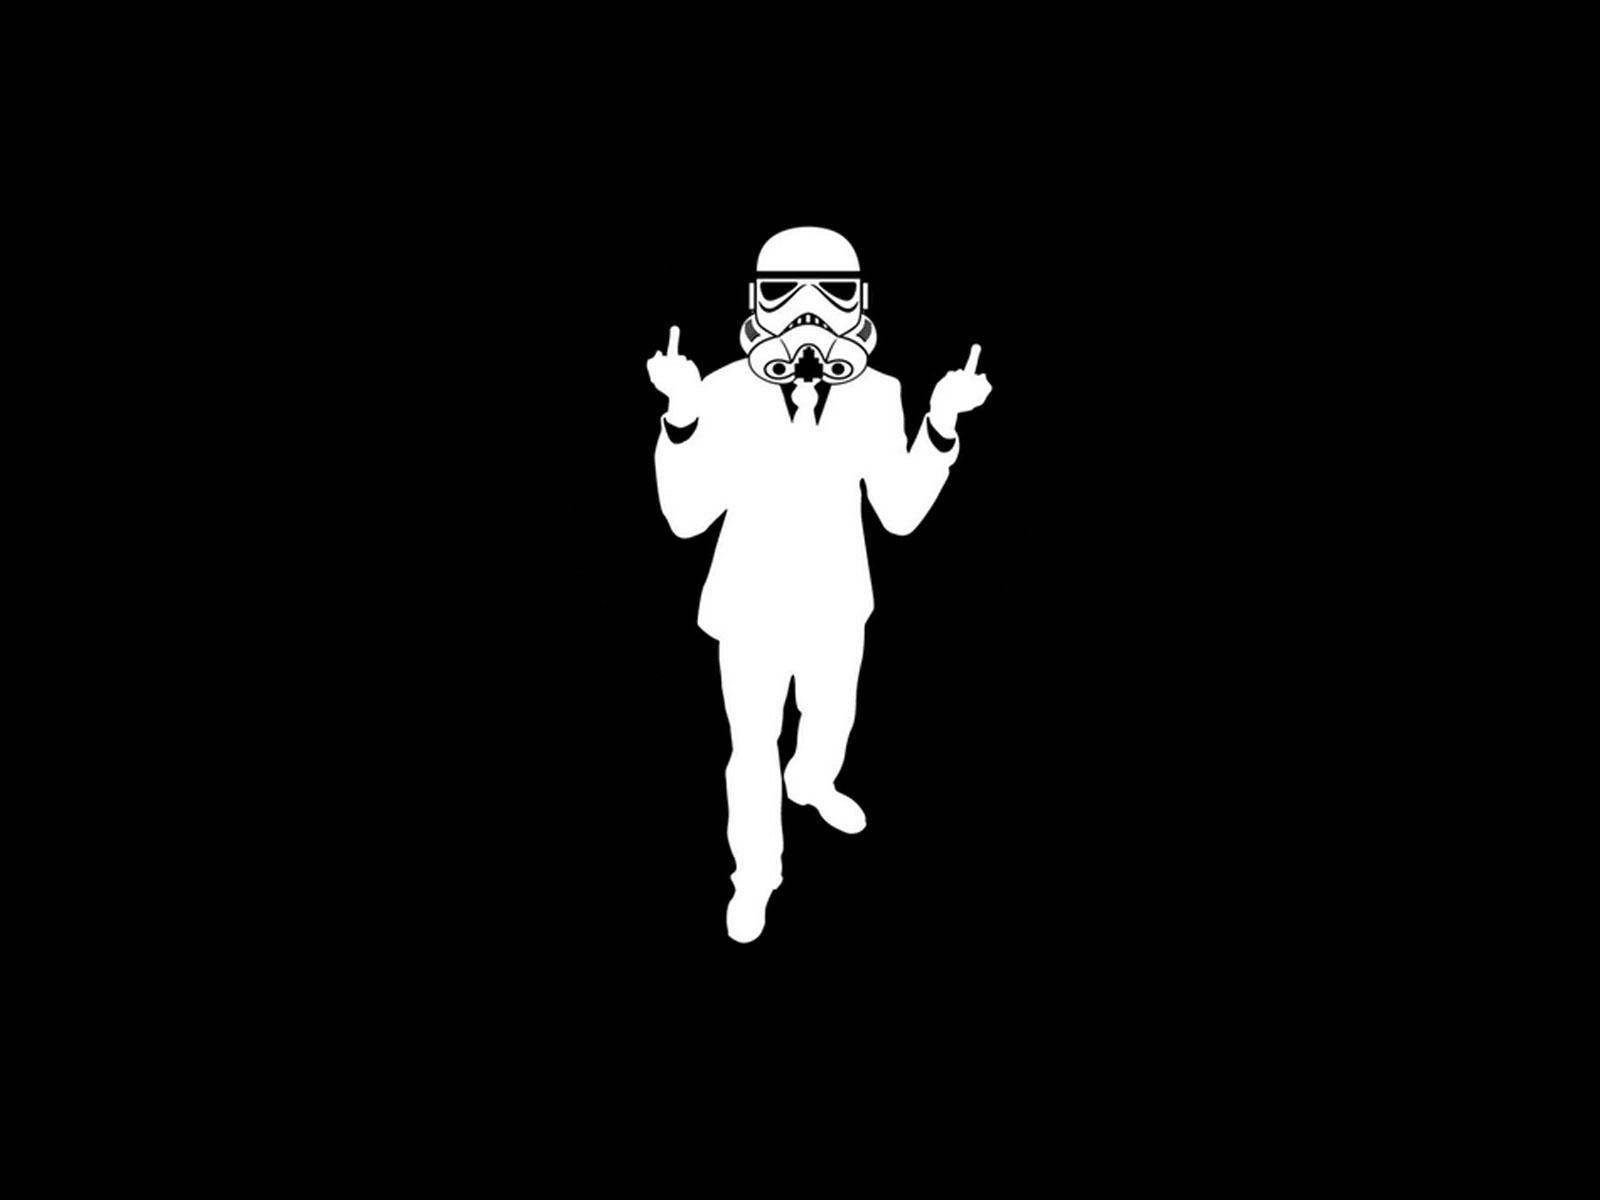 Stormtrooper wallpaper 1600x1200